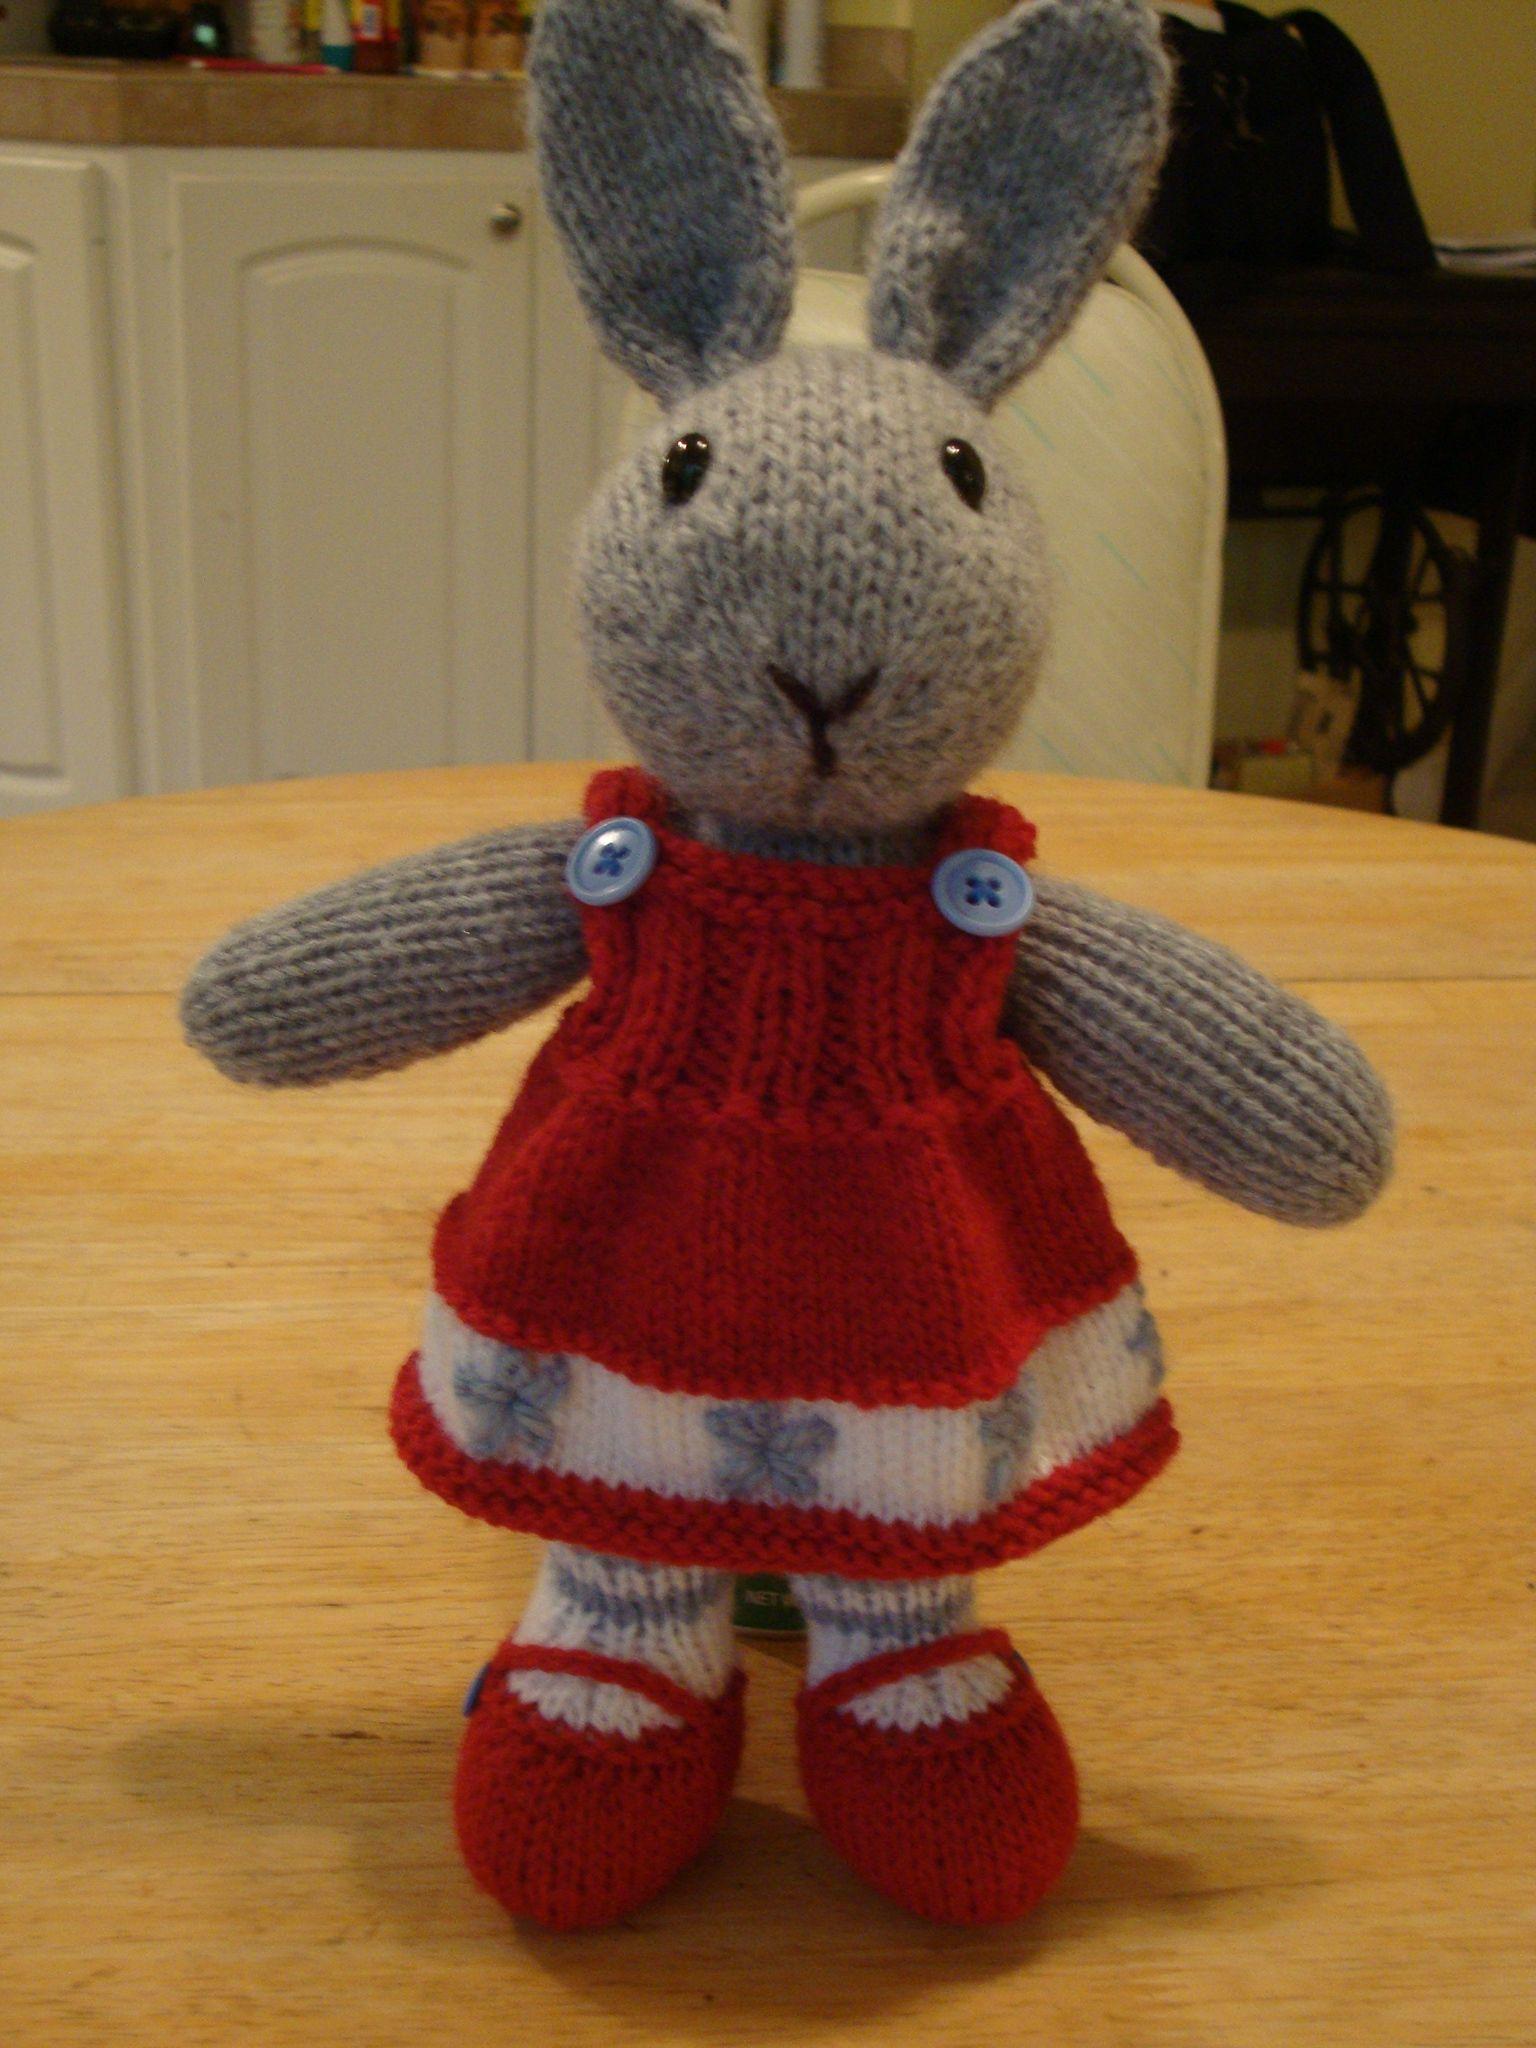 Knitting Toys Free Patterns Easy : Bunty bunny knitted toy rabbit doll pattern by debi